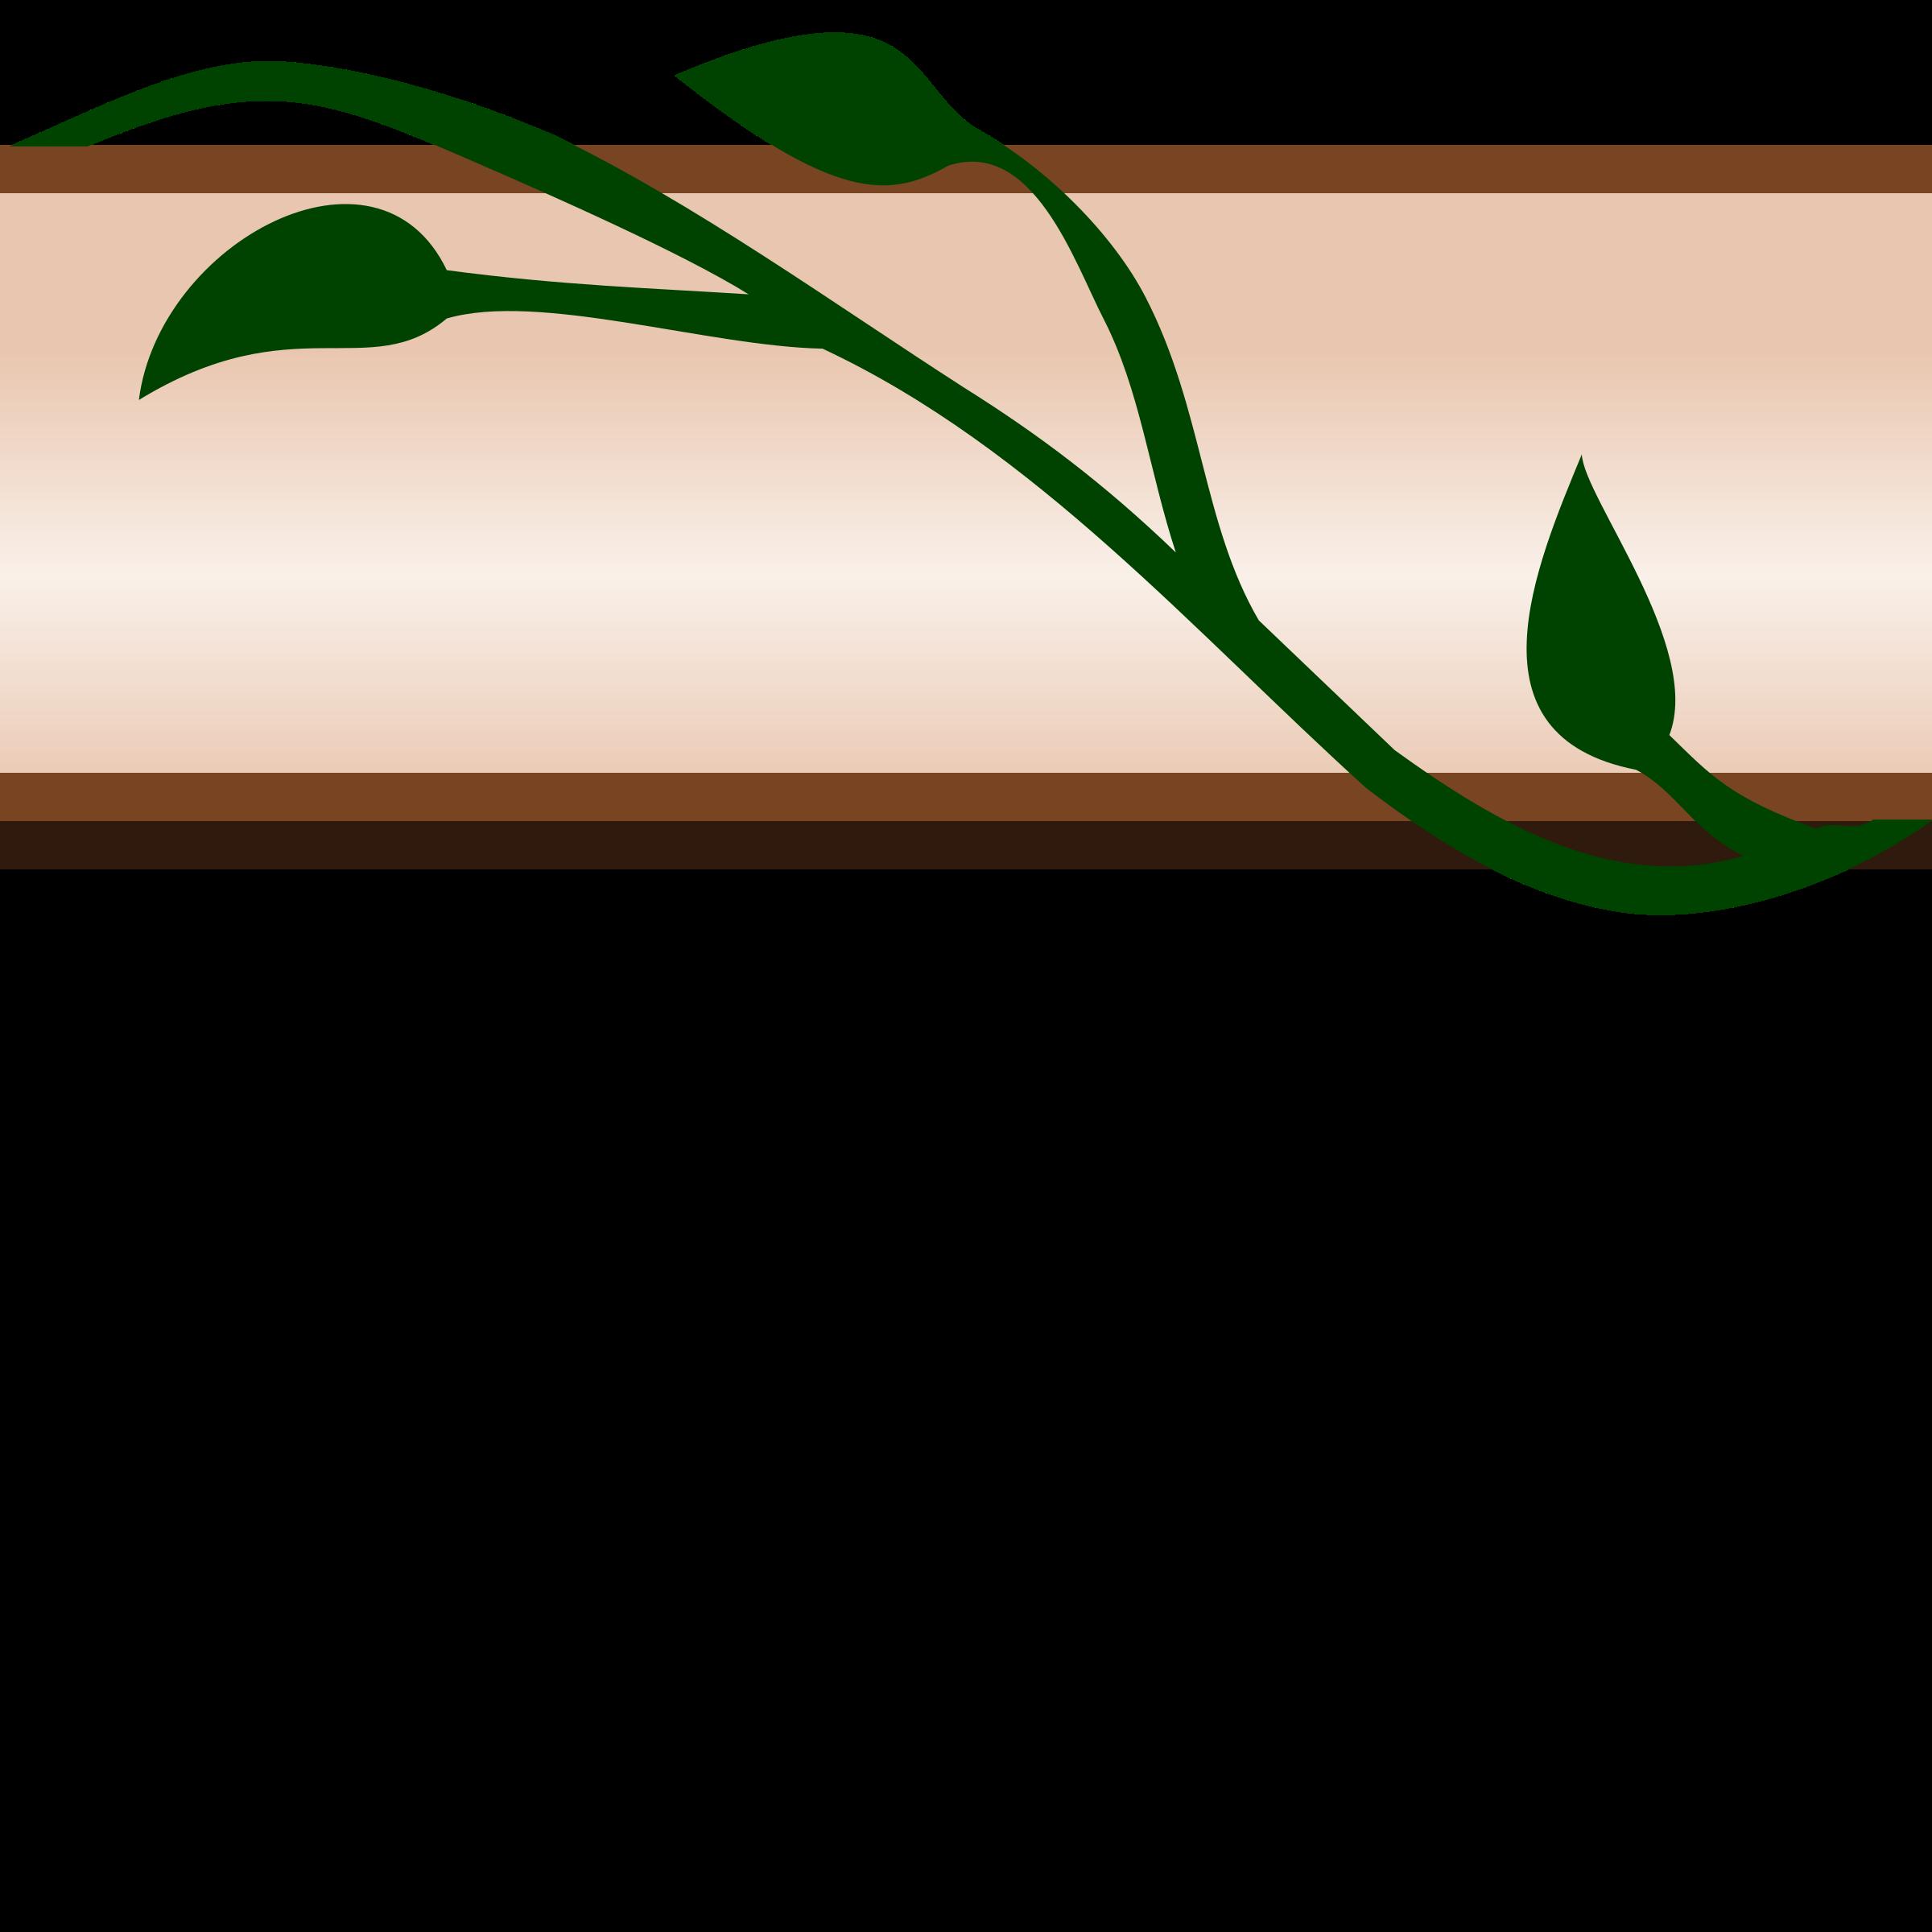 Ivy flower clipart jpg freeuse Clipart - RPG map ivy border 2 jpg freeuse